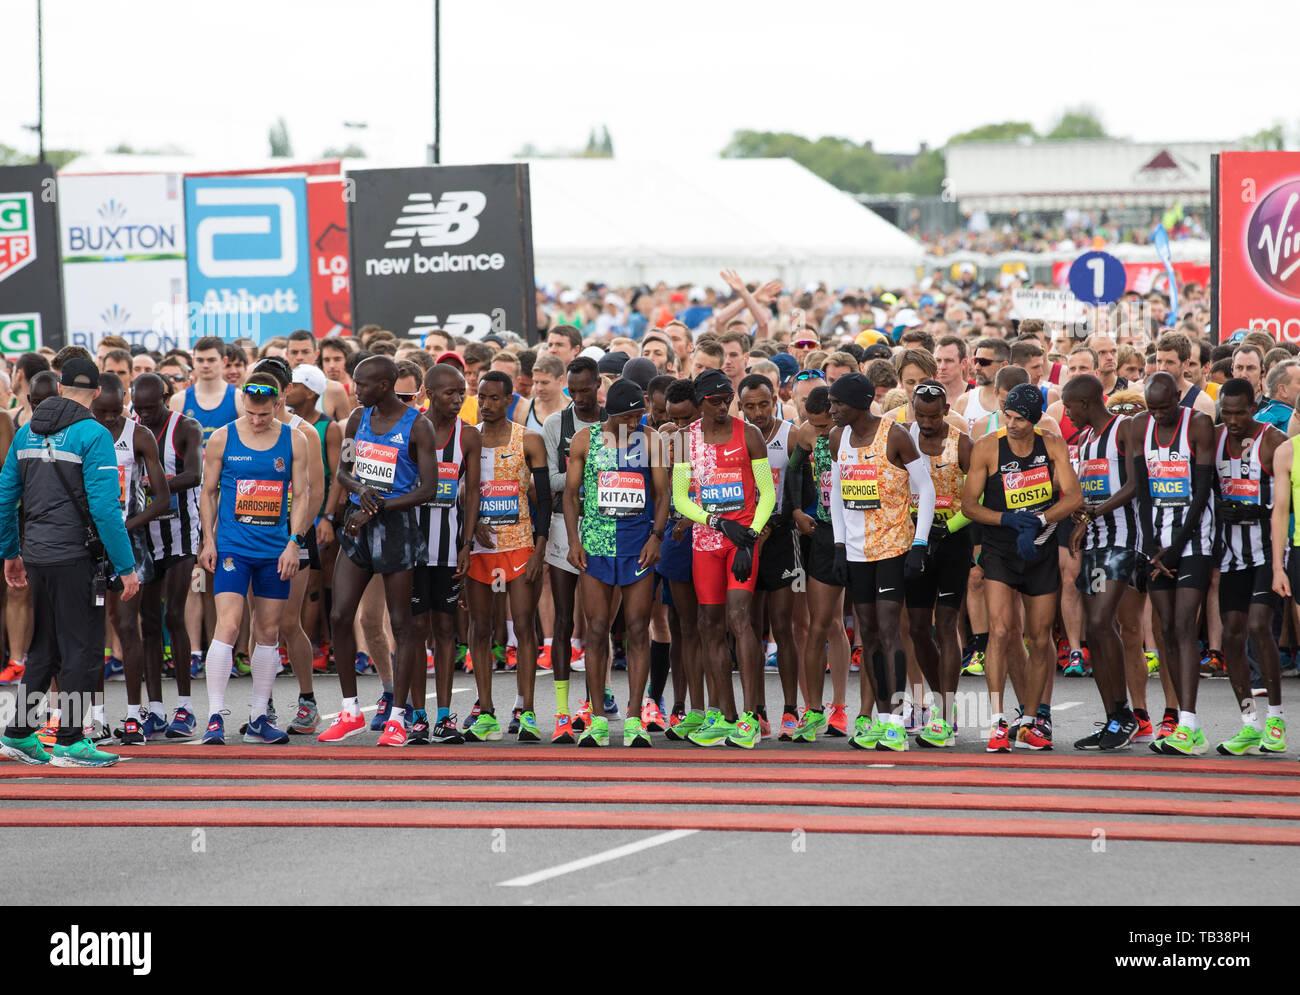 Celebs attend Virgin Money London Marathon Photocall 2019  Featuring: Atmosphere, Elite runners Where: London, United Kingdom When: 28 Apr 2019 Credit: Phil Lewis/WENN.com - Stock Image